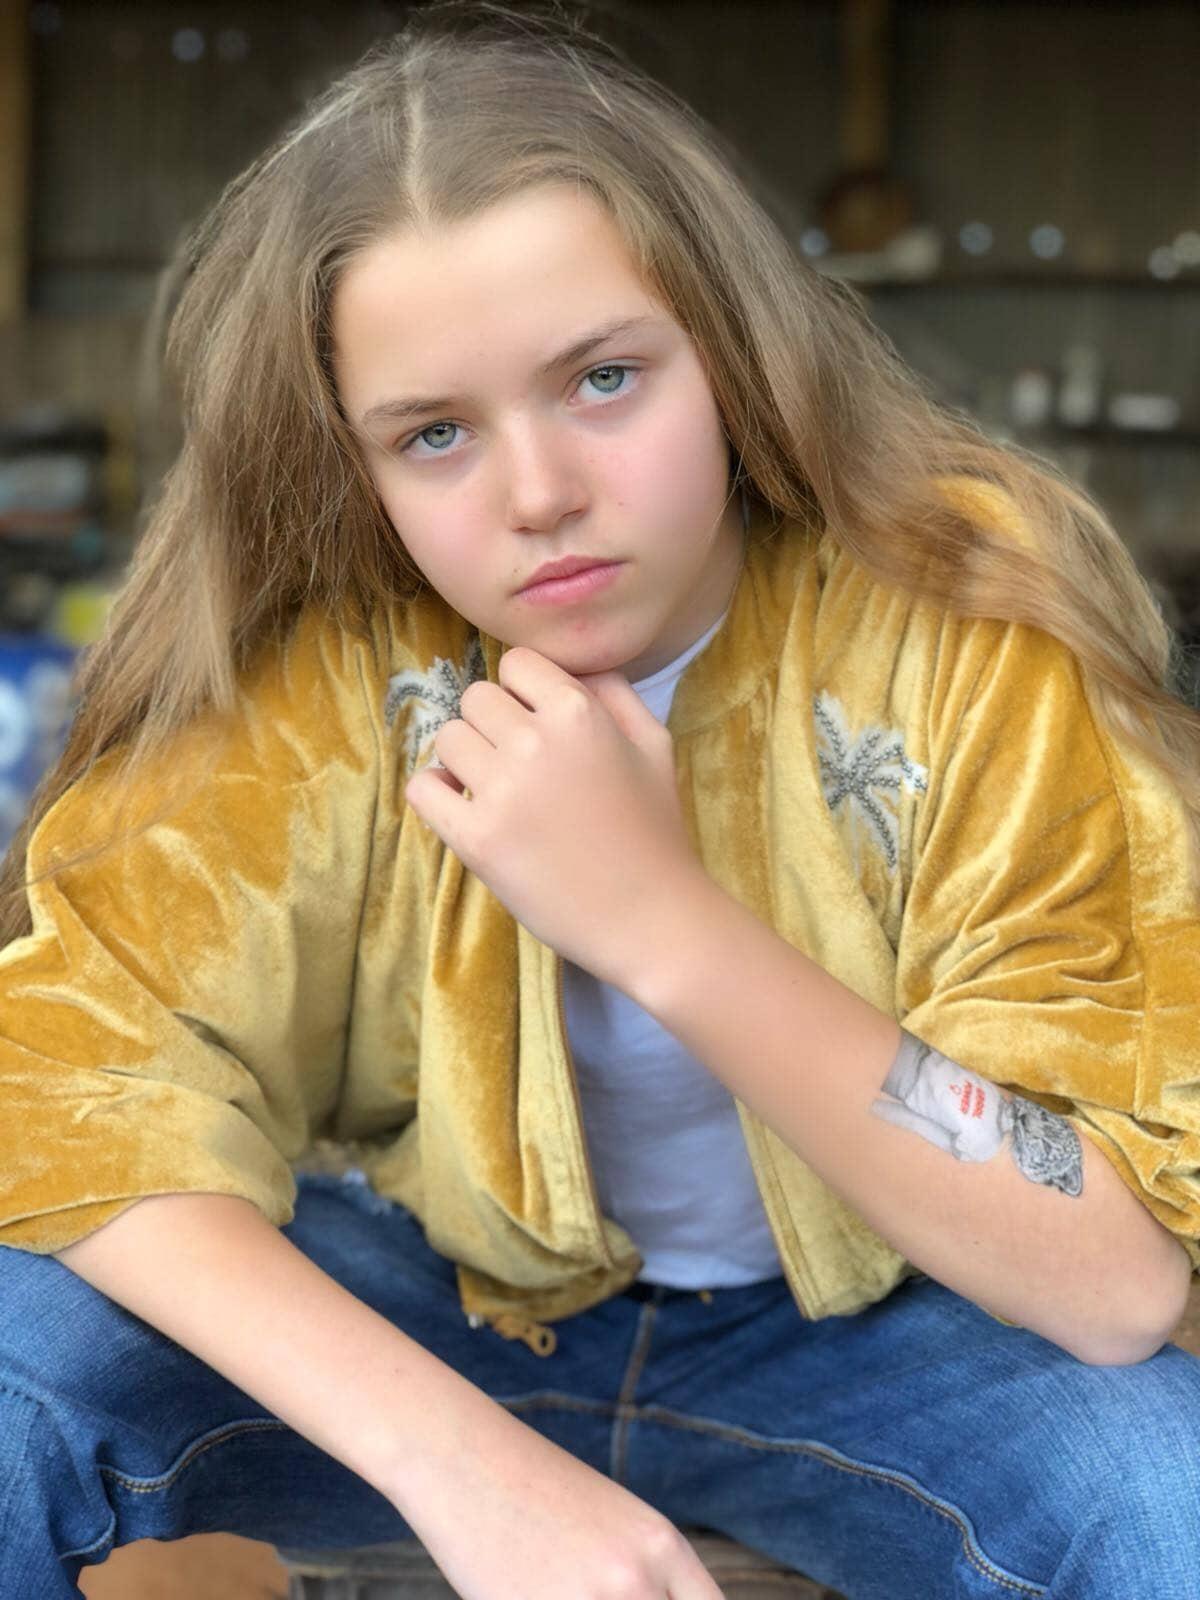 girl wearing yellow jacket, posing